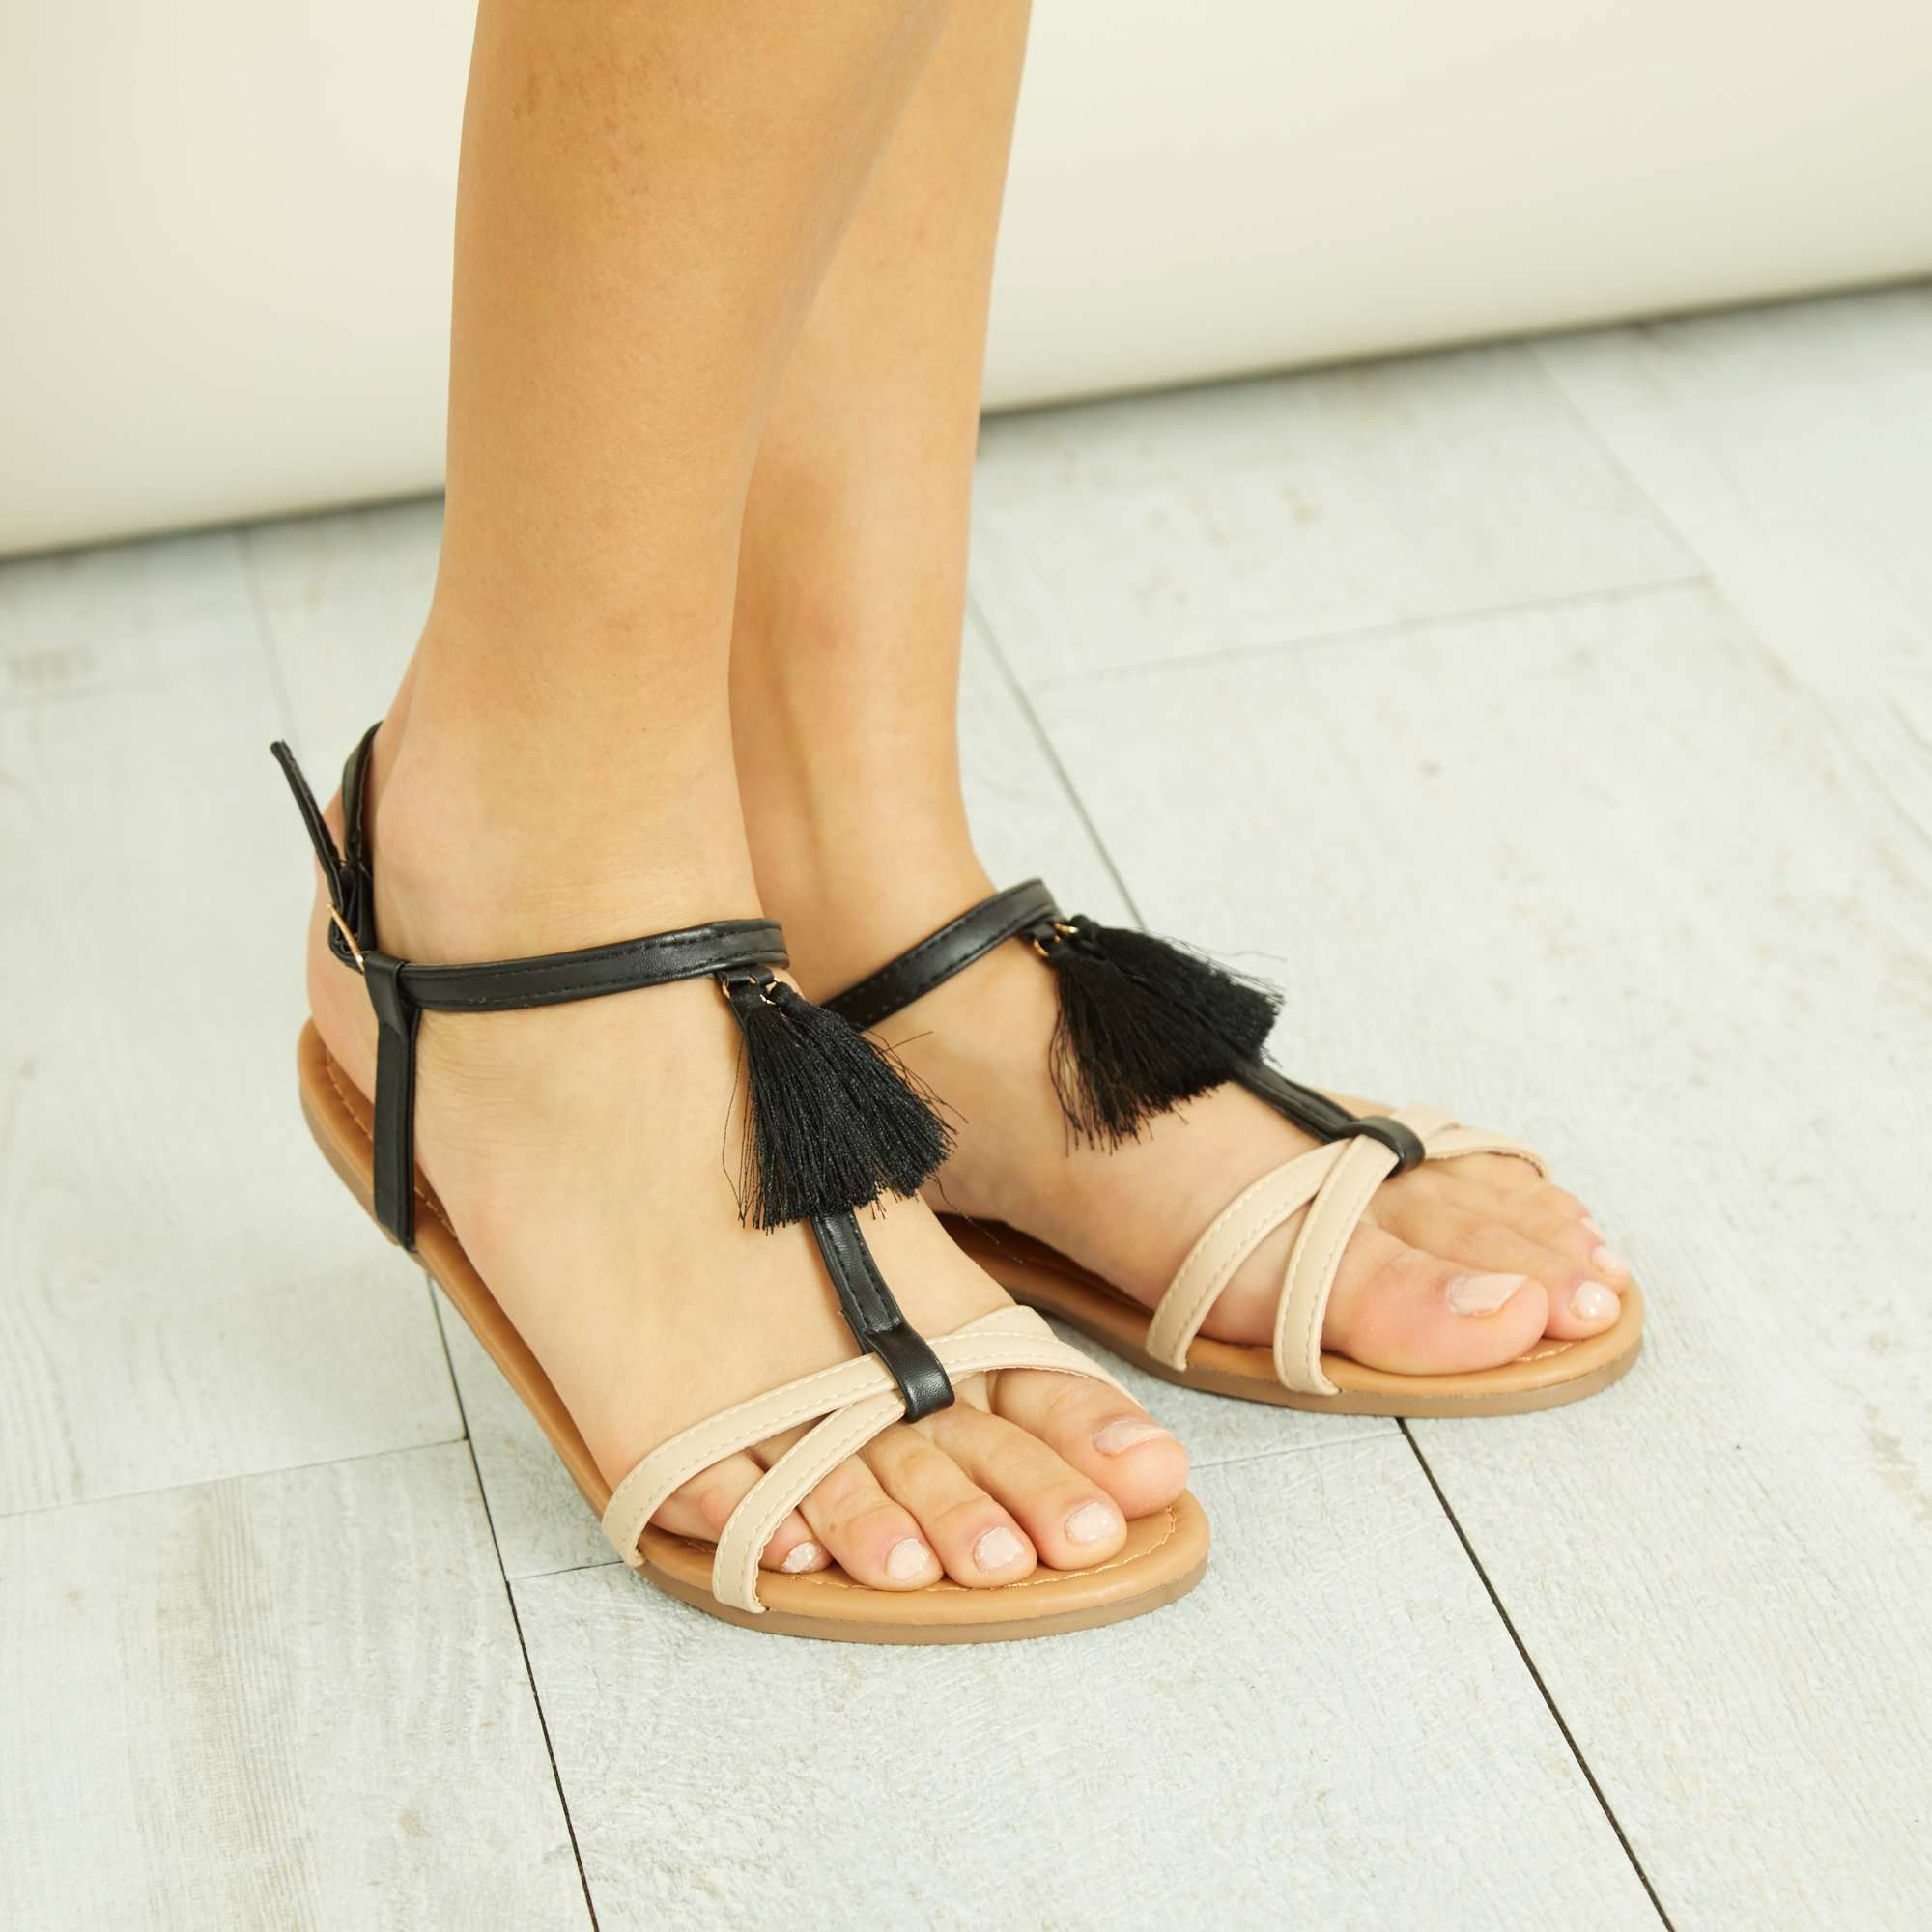 ff21dfbbd952a Sandalias de piel sintética con borlas Mujer - BEIGE - Kiabi - 13